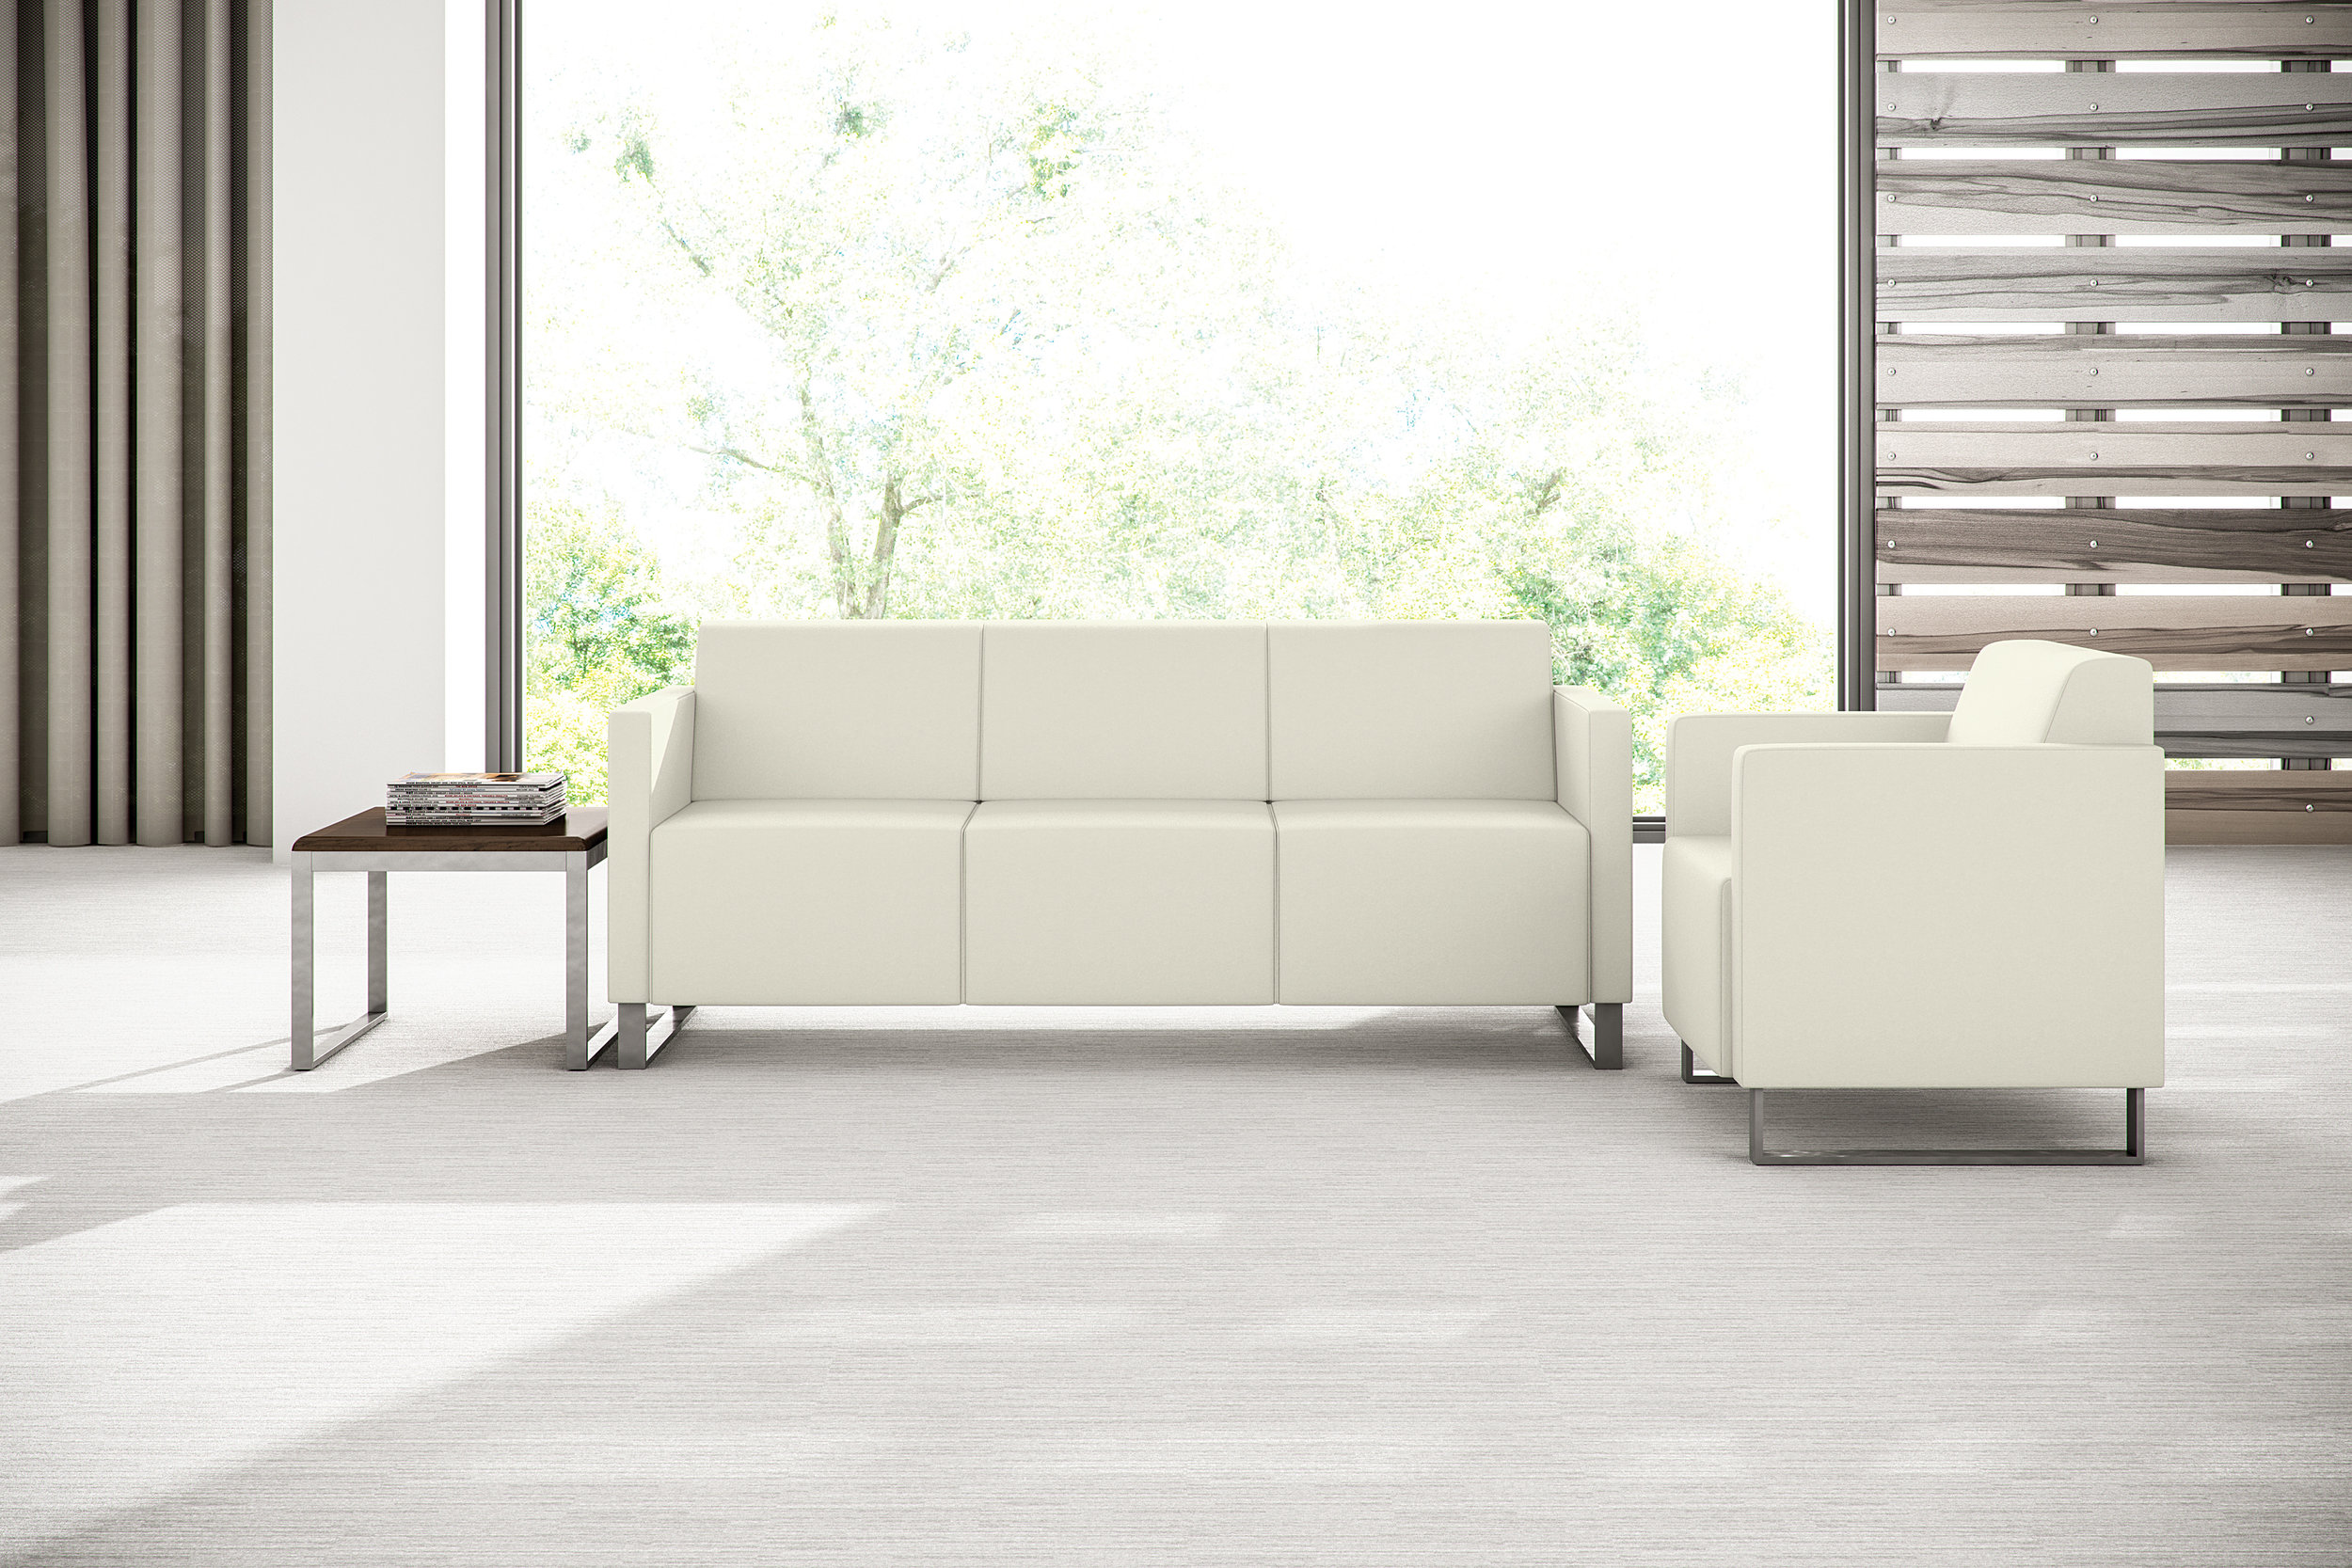 Stance Cassia Lounge.jpg